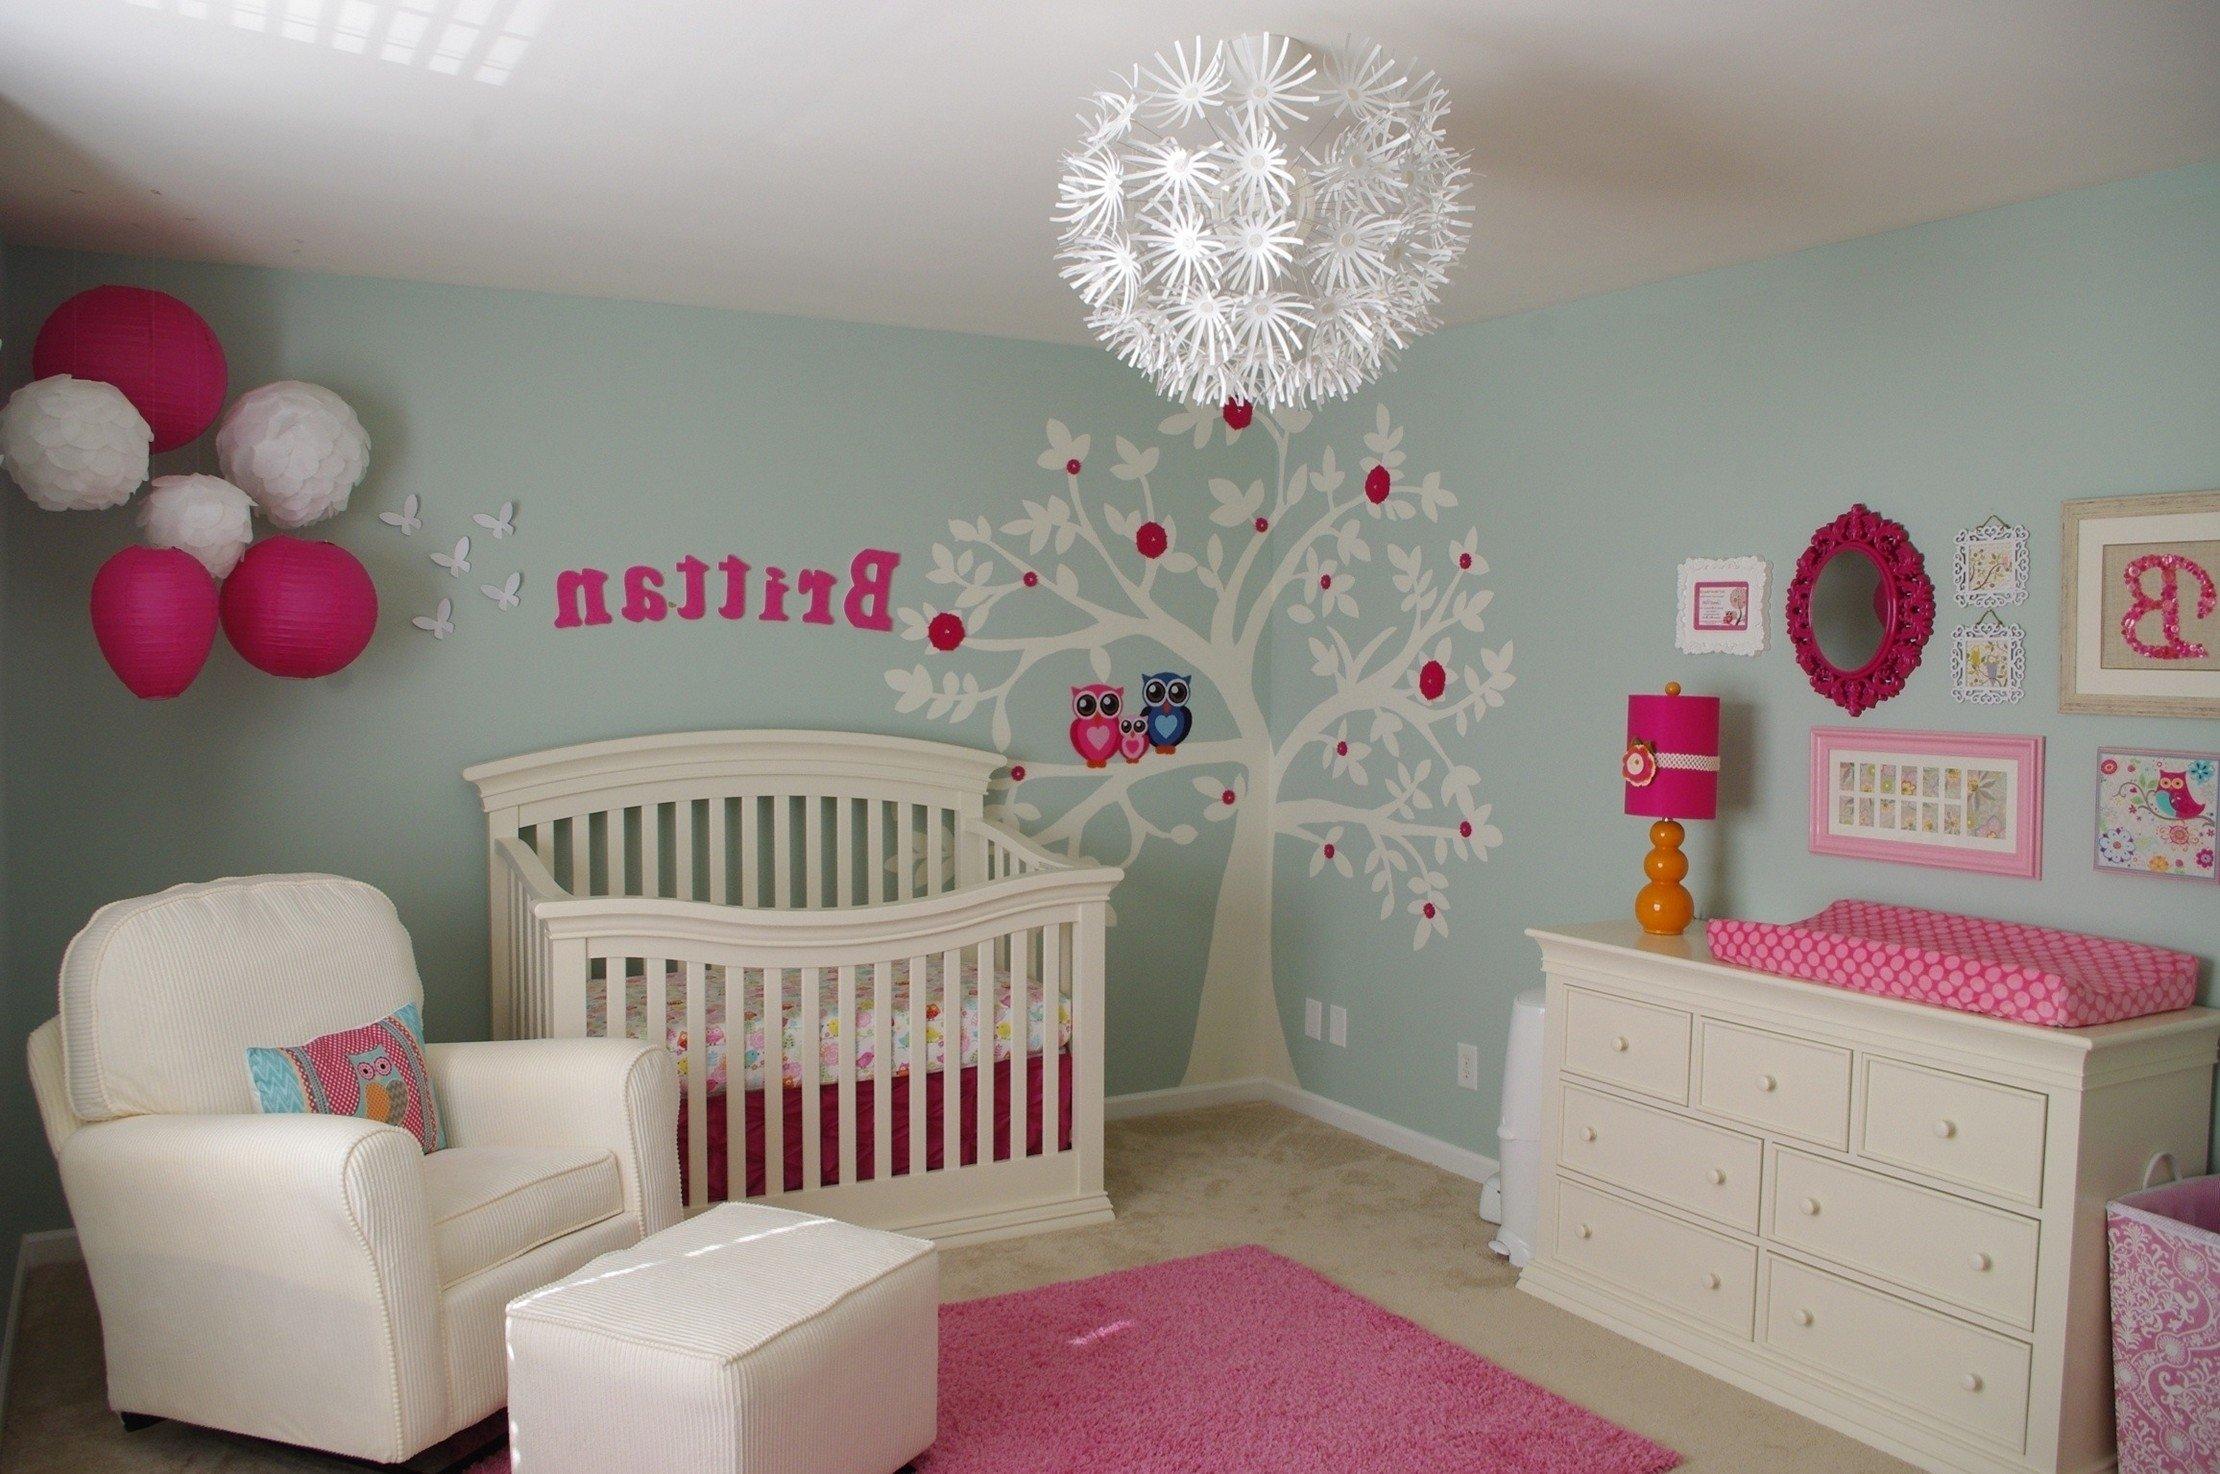 10 Spectacular Baby Girl Room Theme Ideas bedroom 46 baby girls room decor photos new born of bedroom